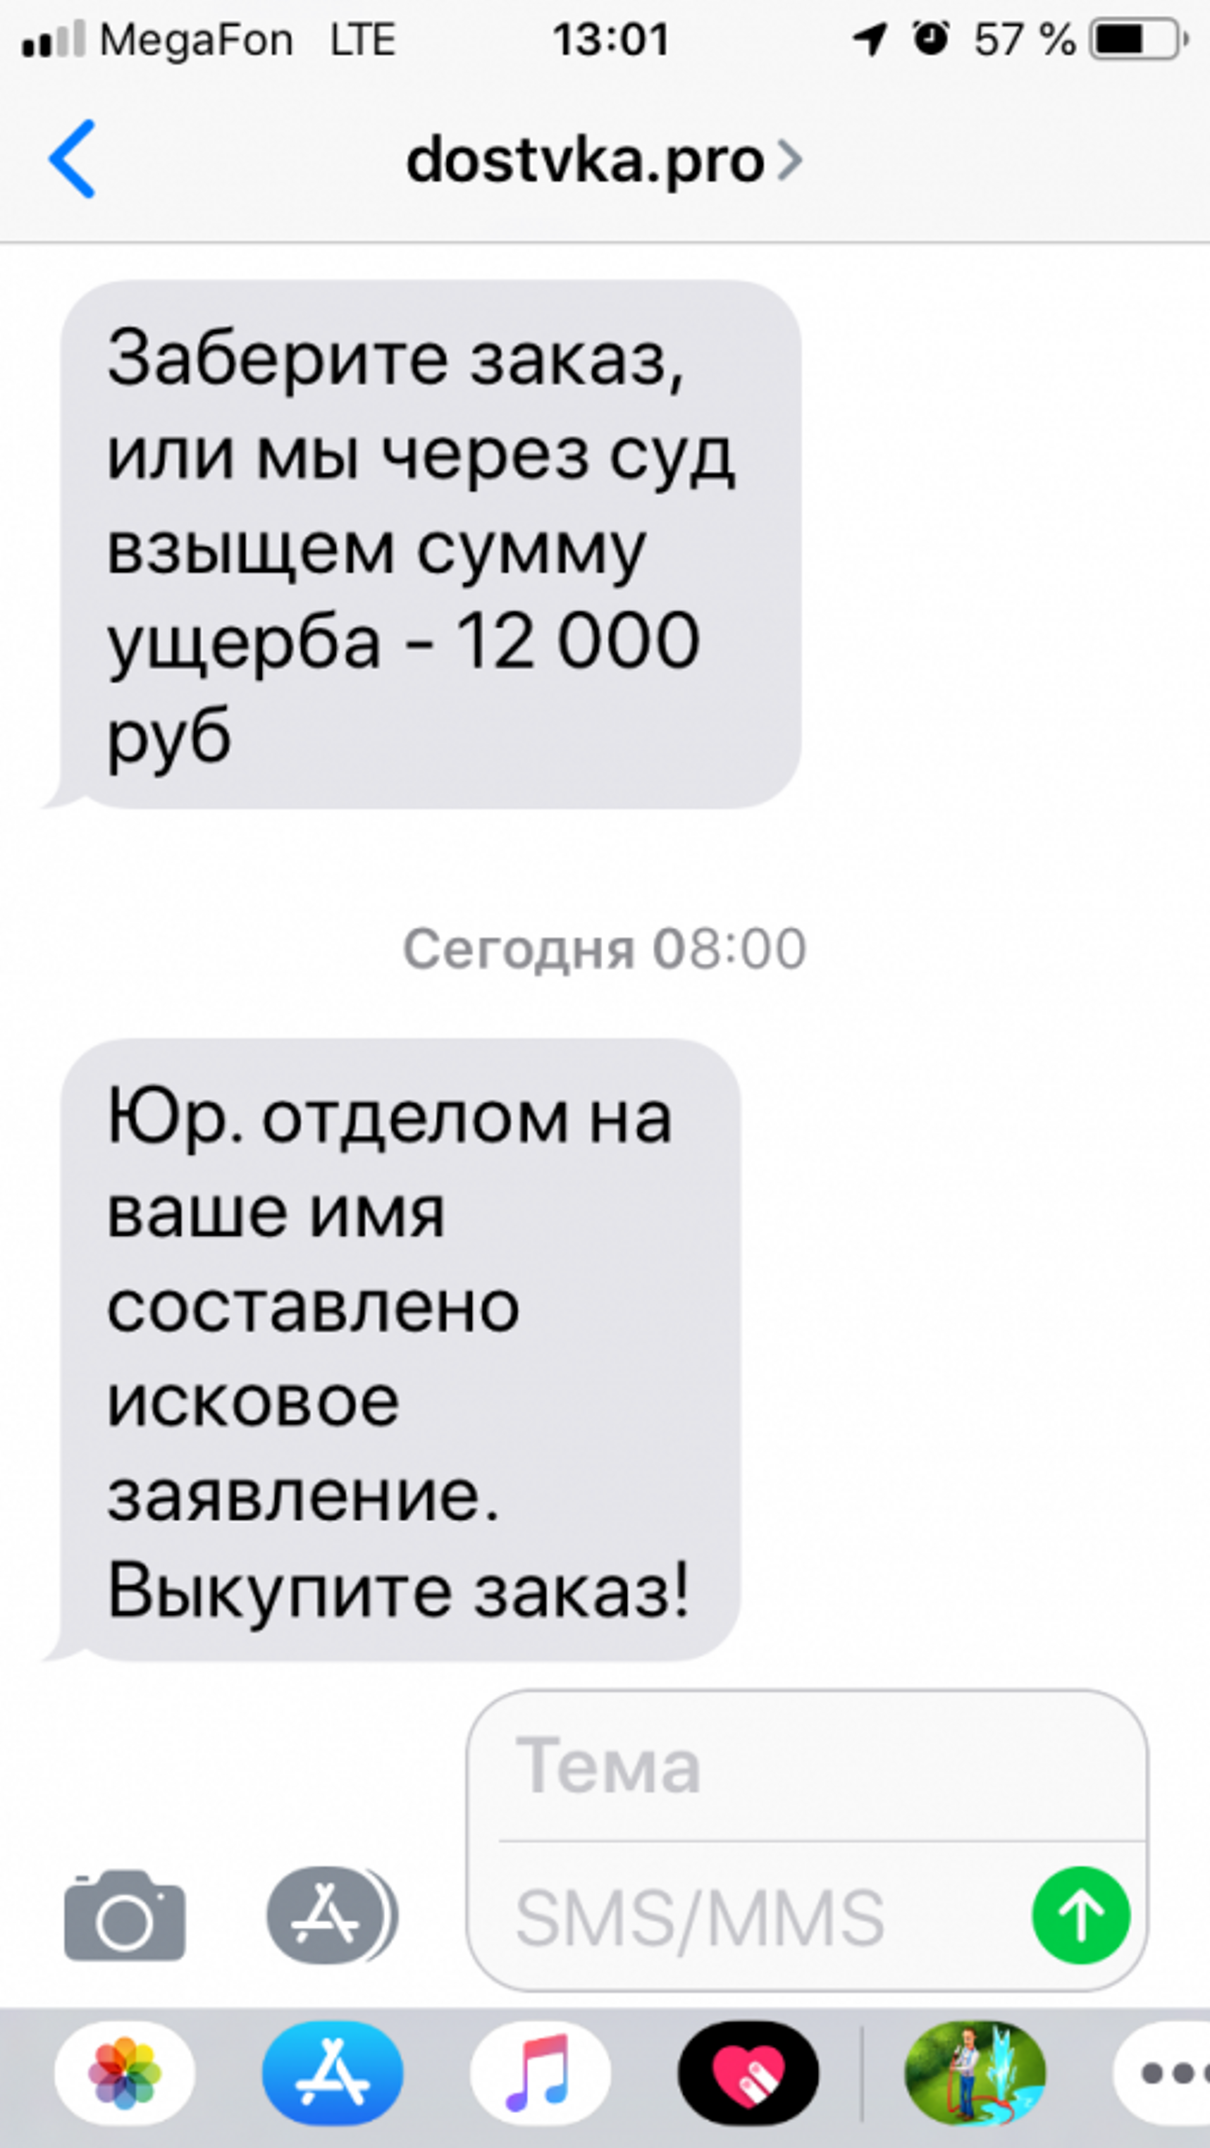 Жалоба-отзыв: Dostvka.pro - Угрозы.  Фото №1